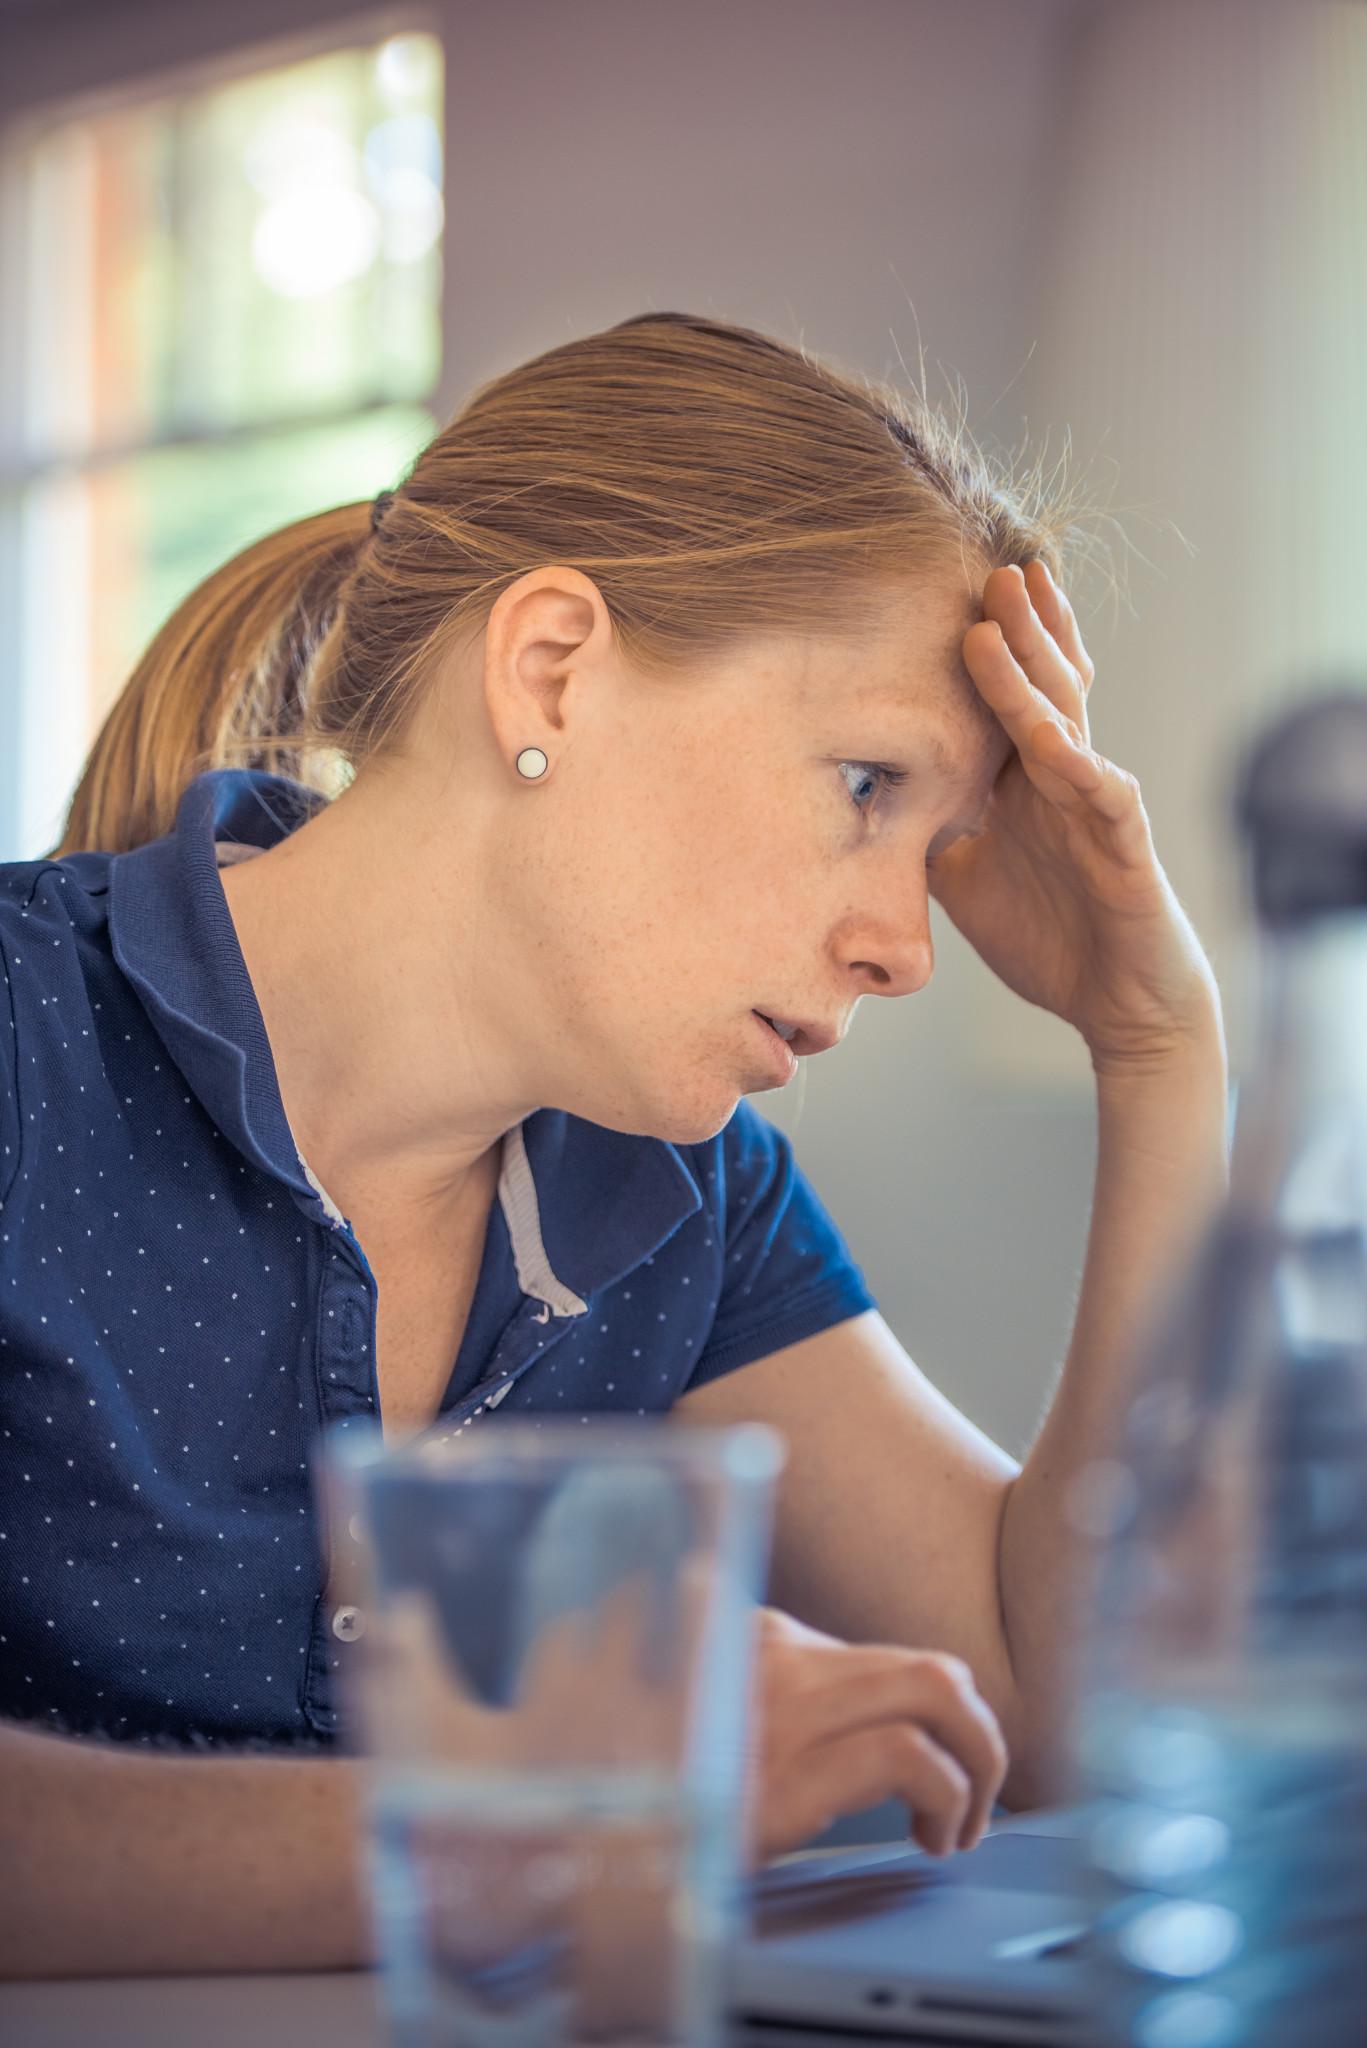 How Chronic Stress Leads to Hormone Imbalance